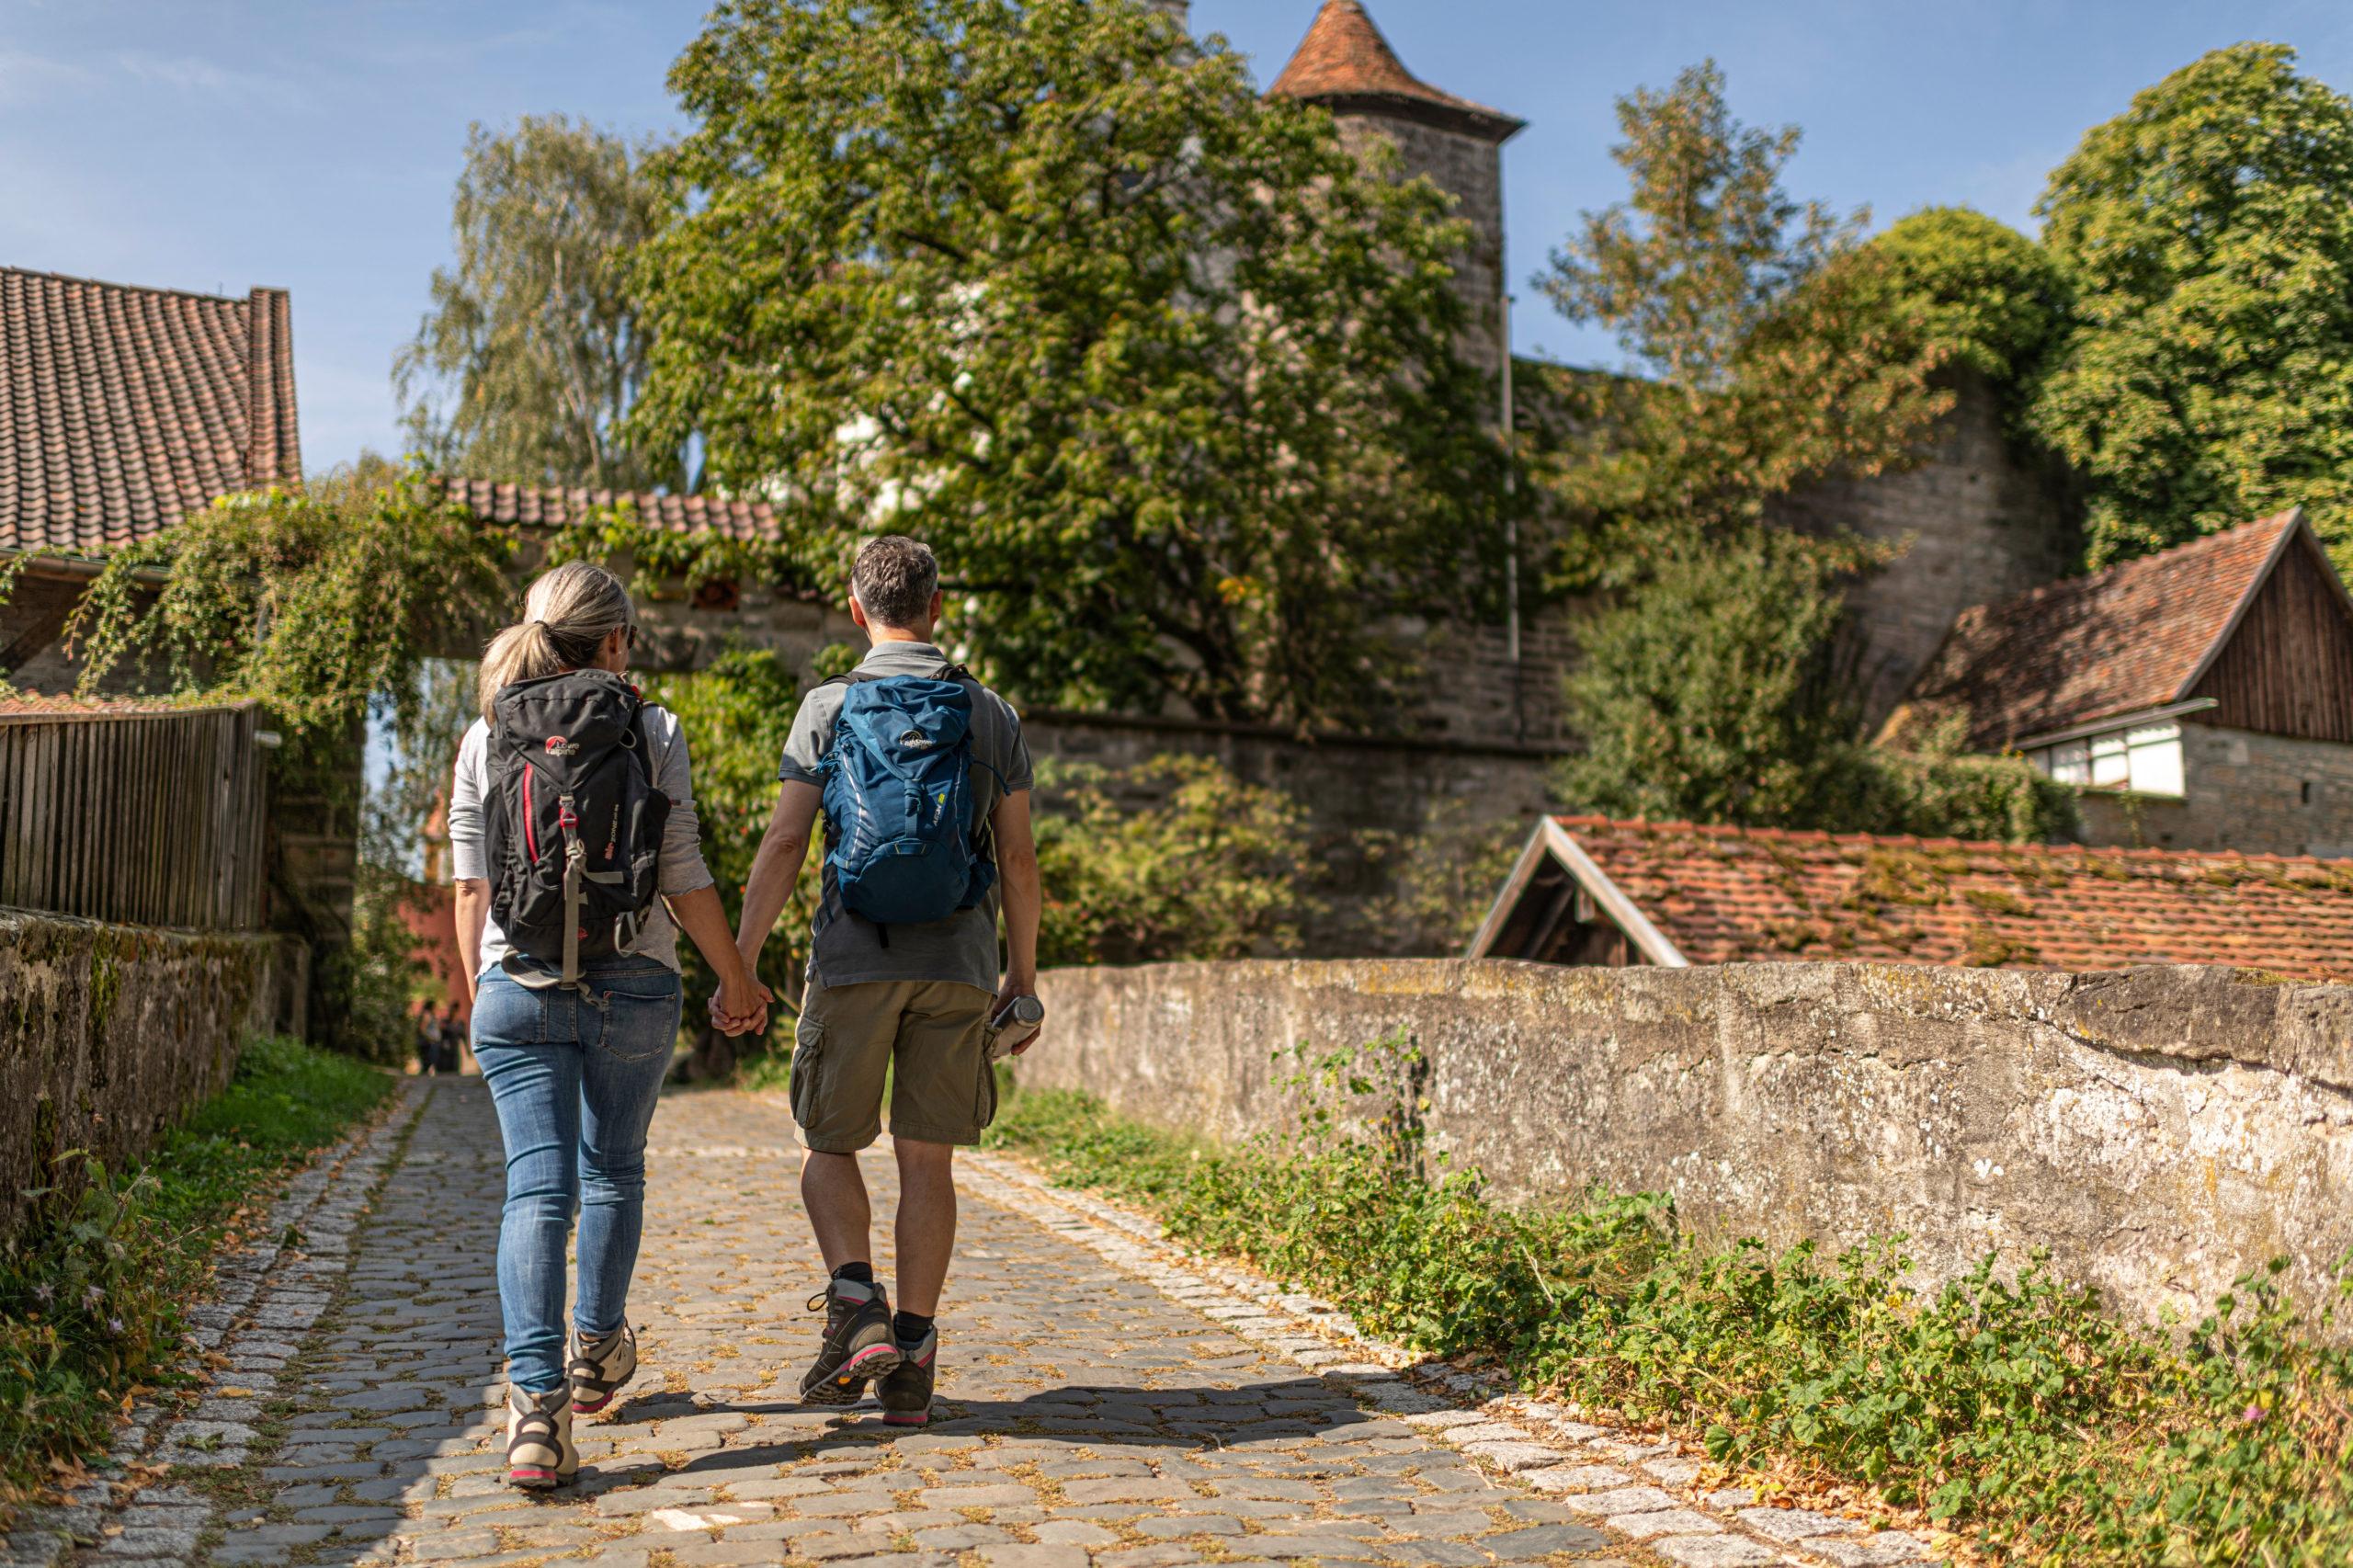 Wanderidylle im Hohenloher Bühlertal